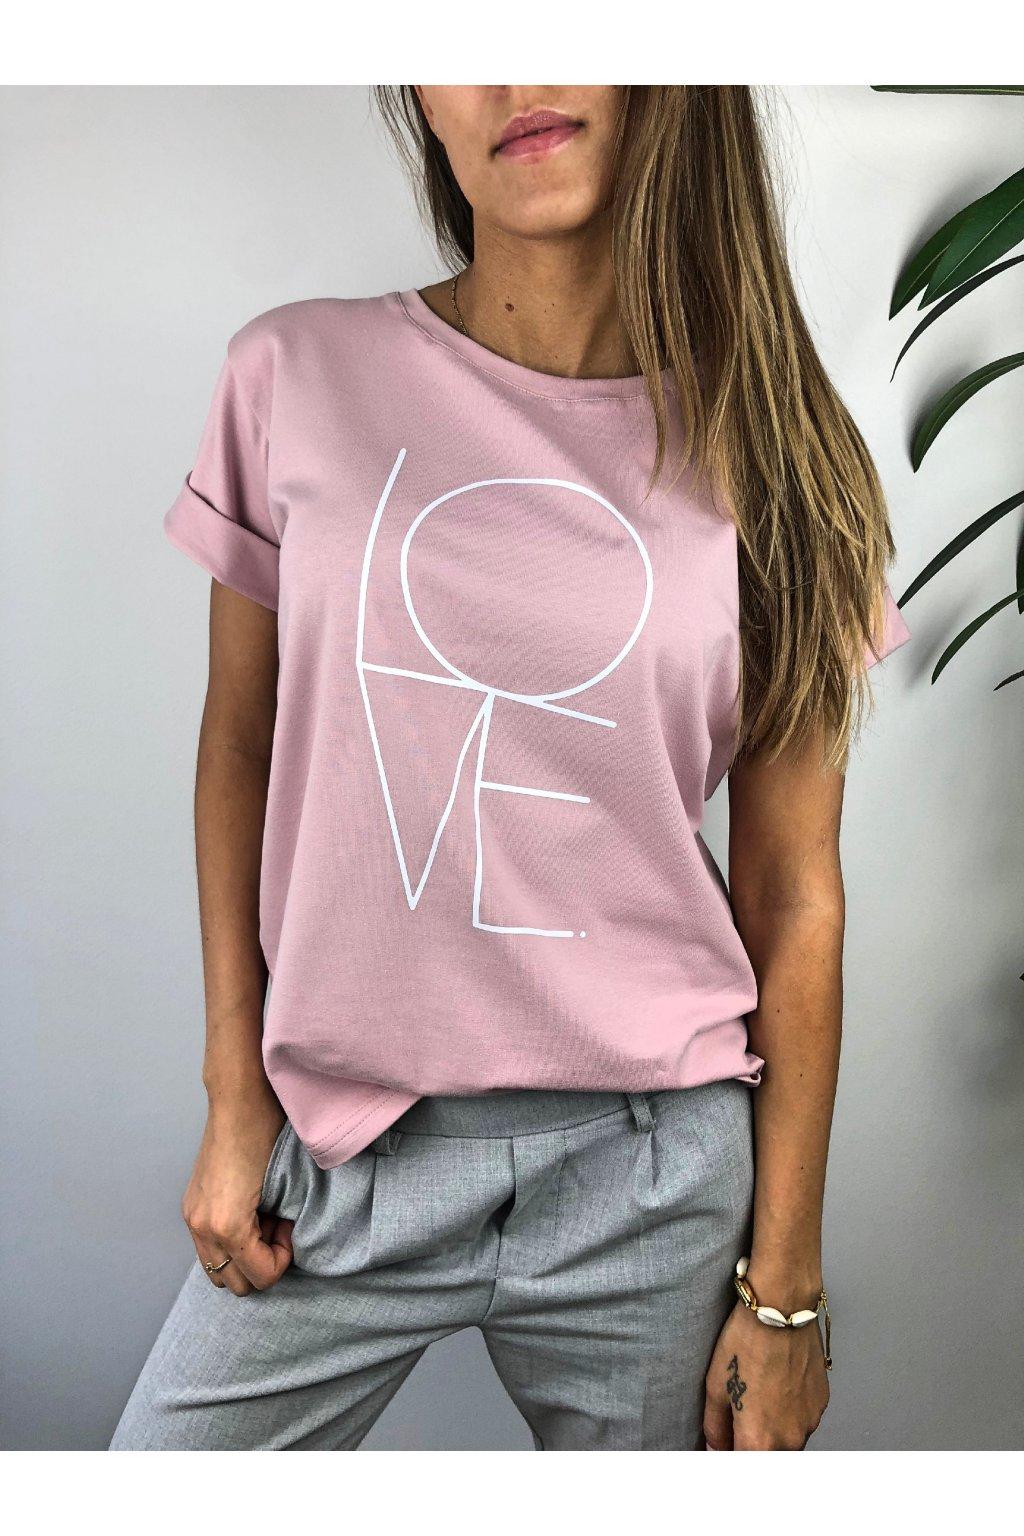 damske tricko love rose eshopat cz 1